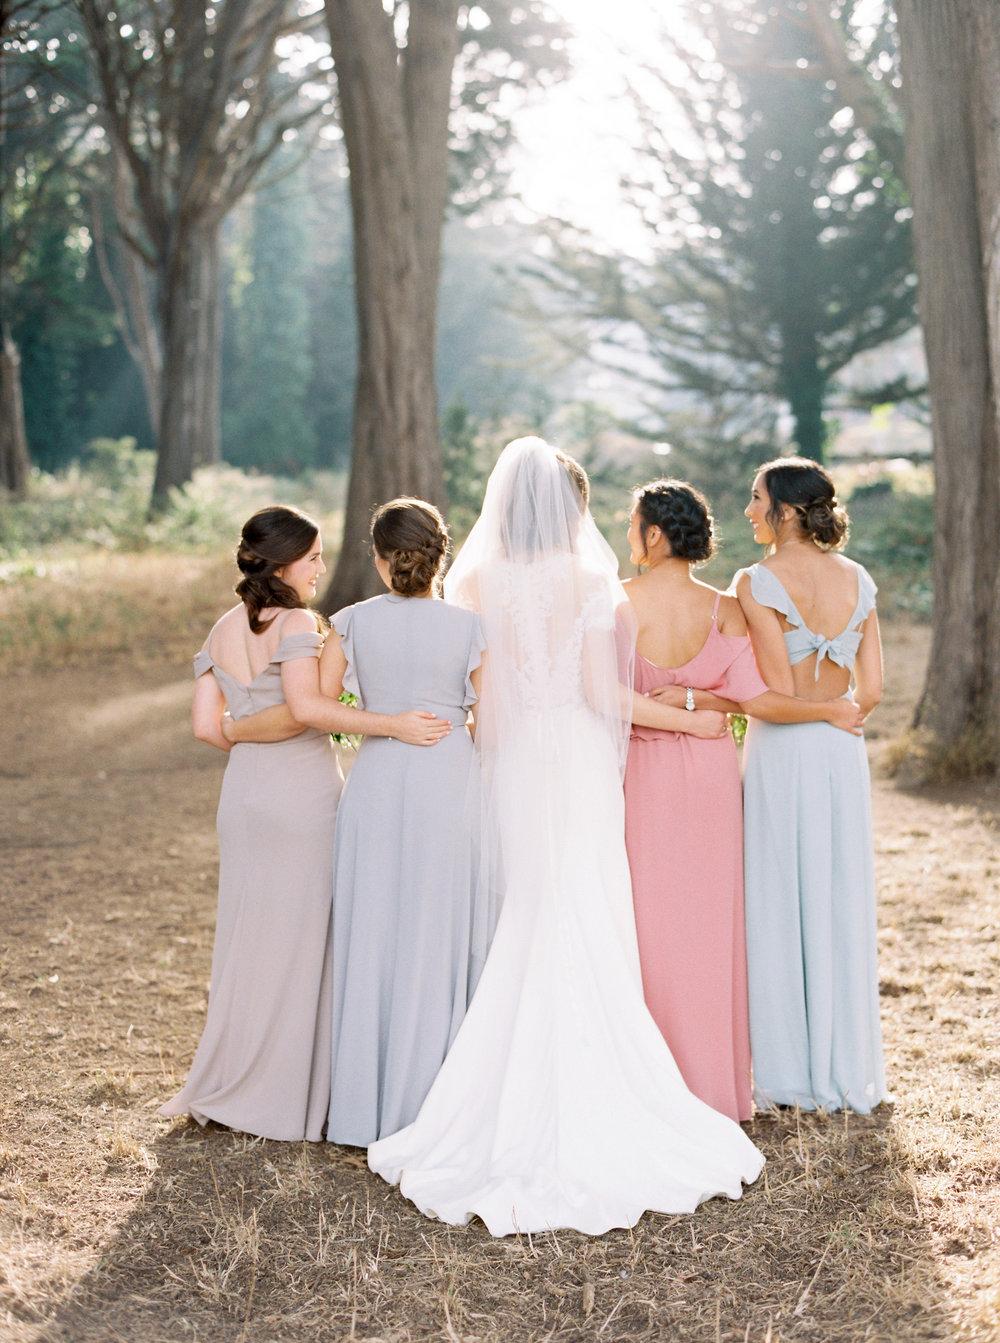 Log-cabin-wedding-in-presidio-san-francisco-california-desintation-wedding-photography-73.jpg